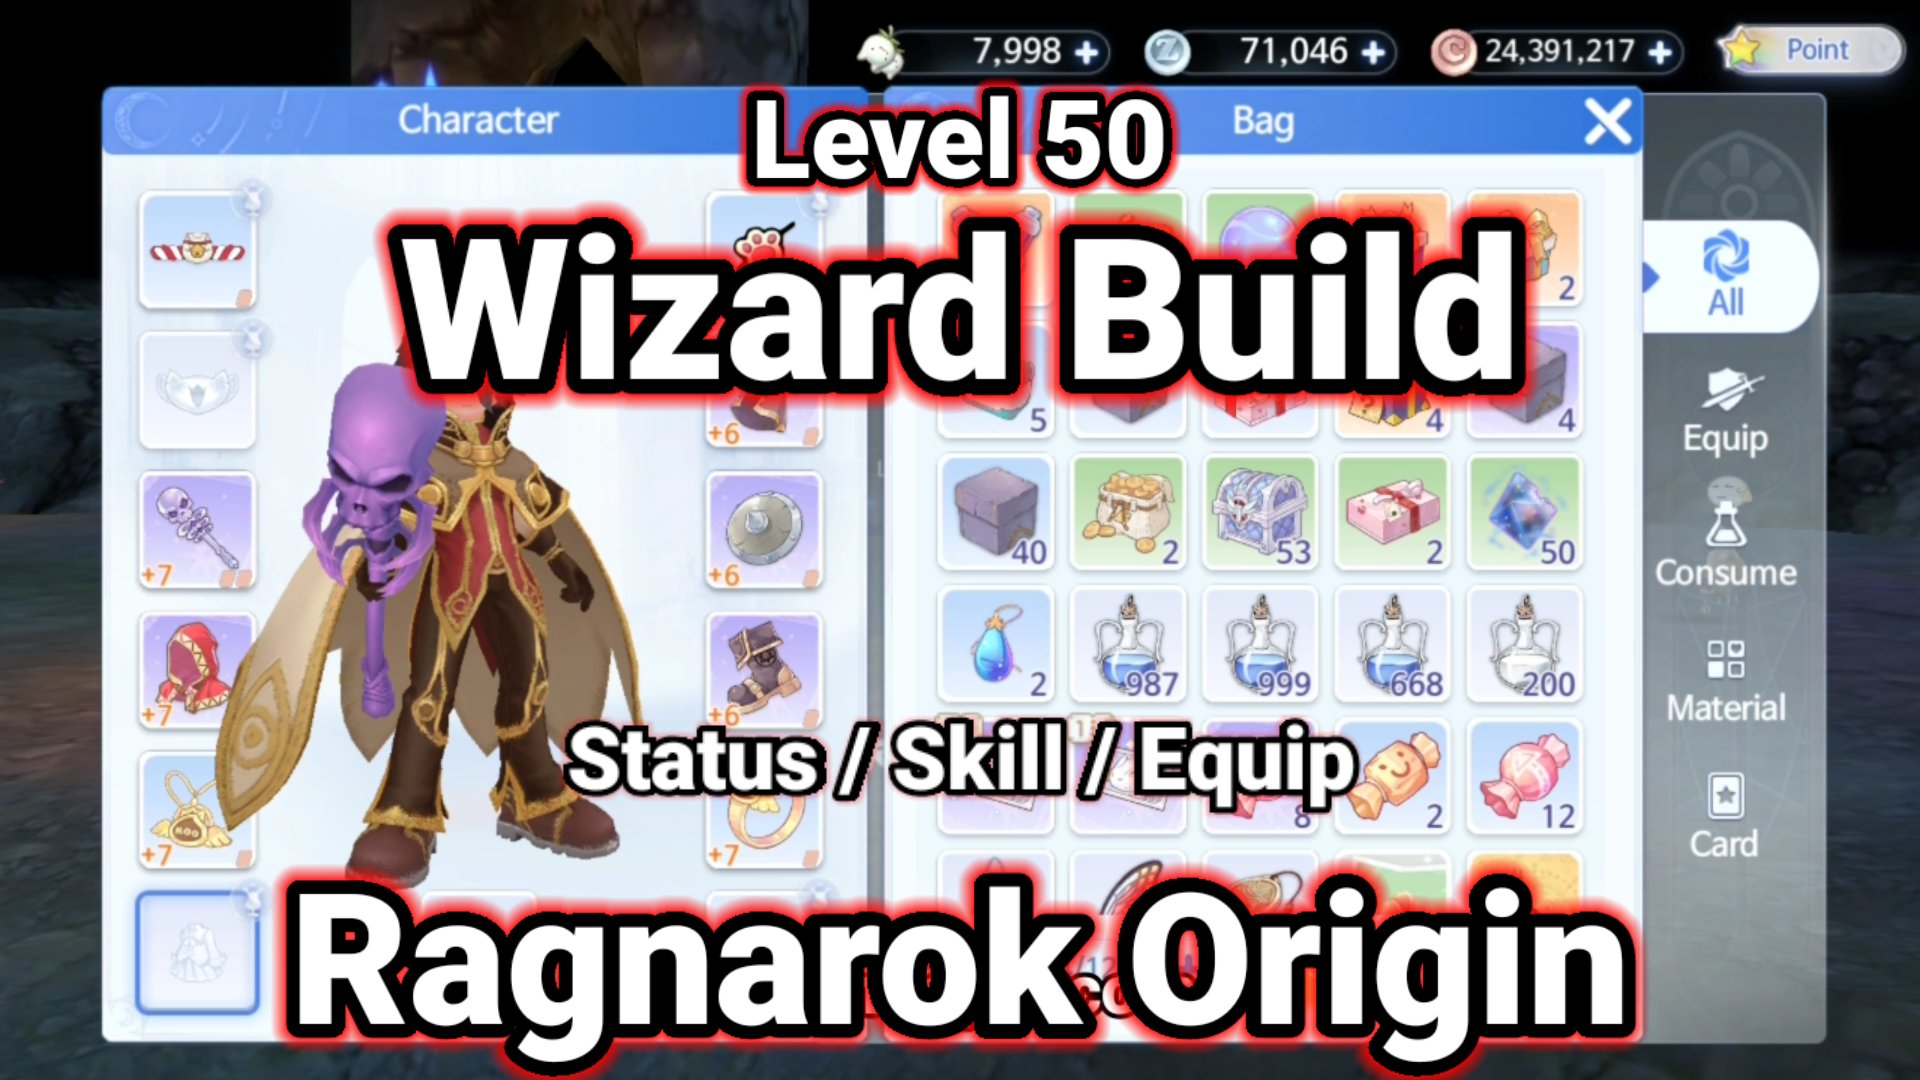 Level 50 Wizard Build Ragnarok Origin ラグオリ | 라그나로크 오리진 1